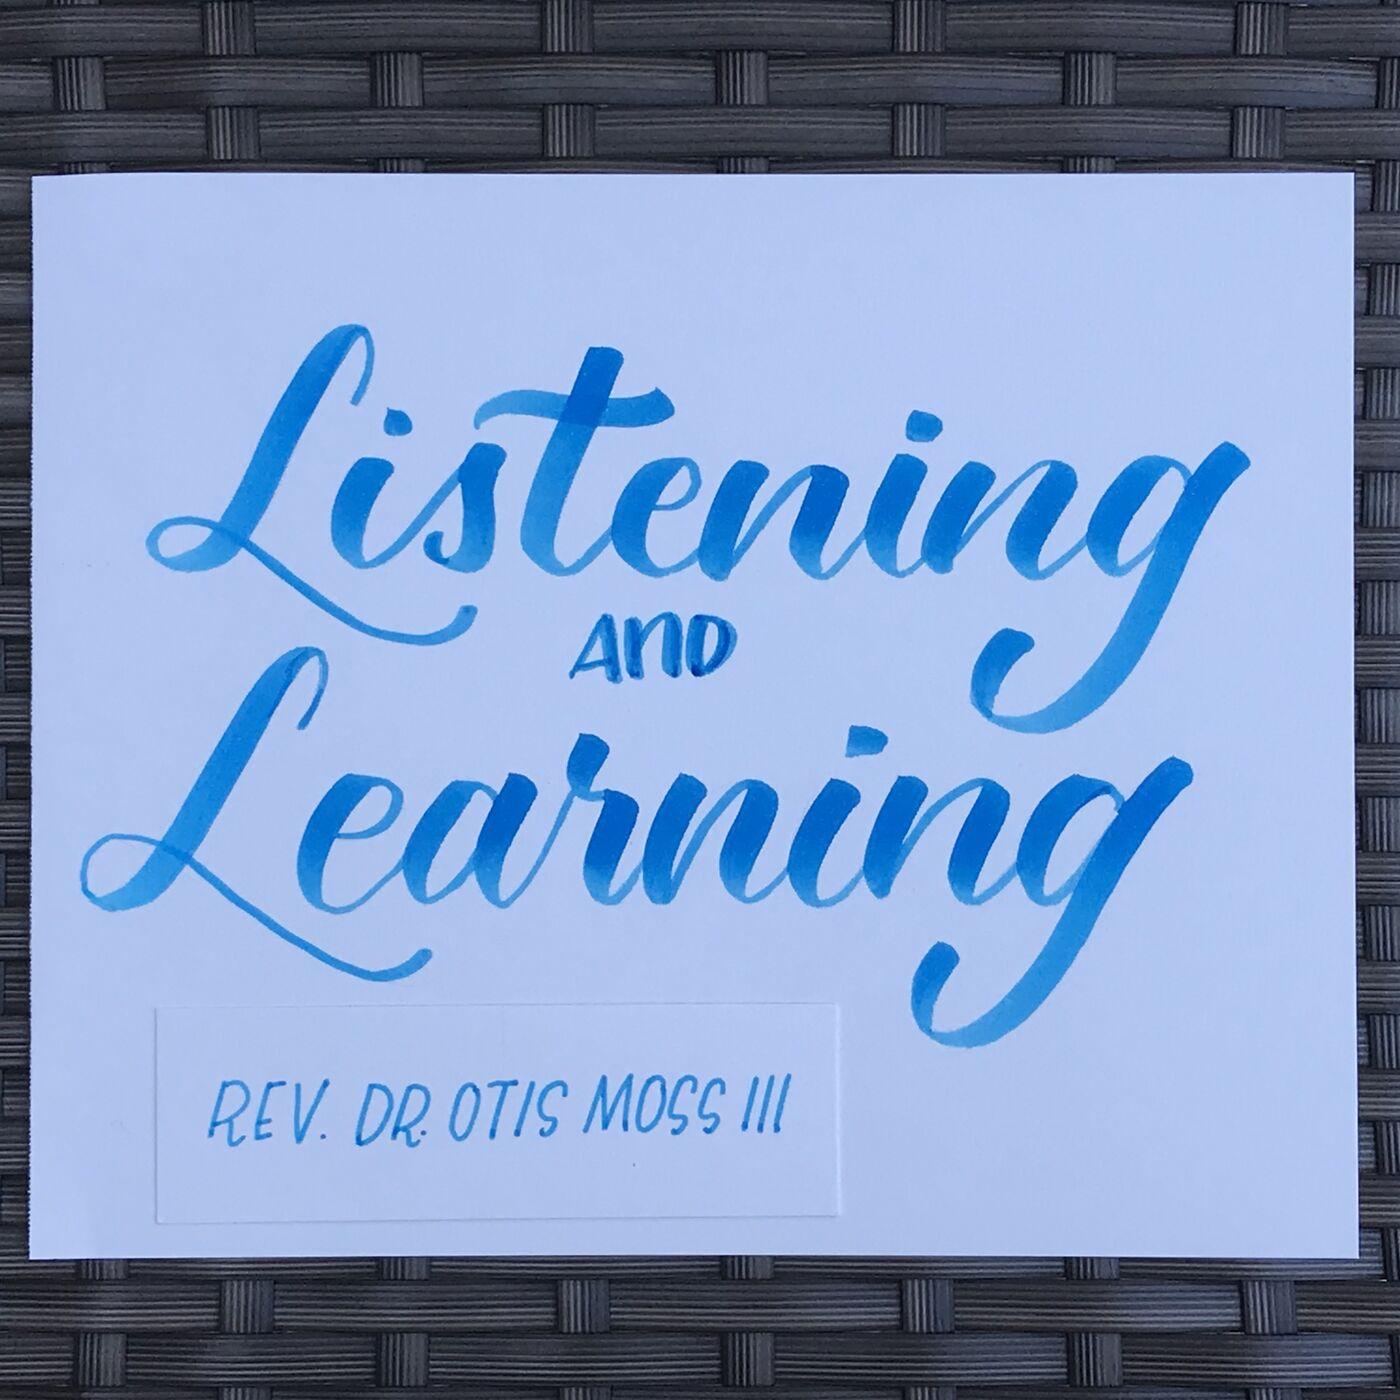 Listening and Learning: Rev. Dr. Otis Moss III